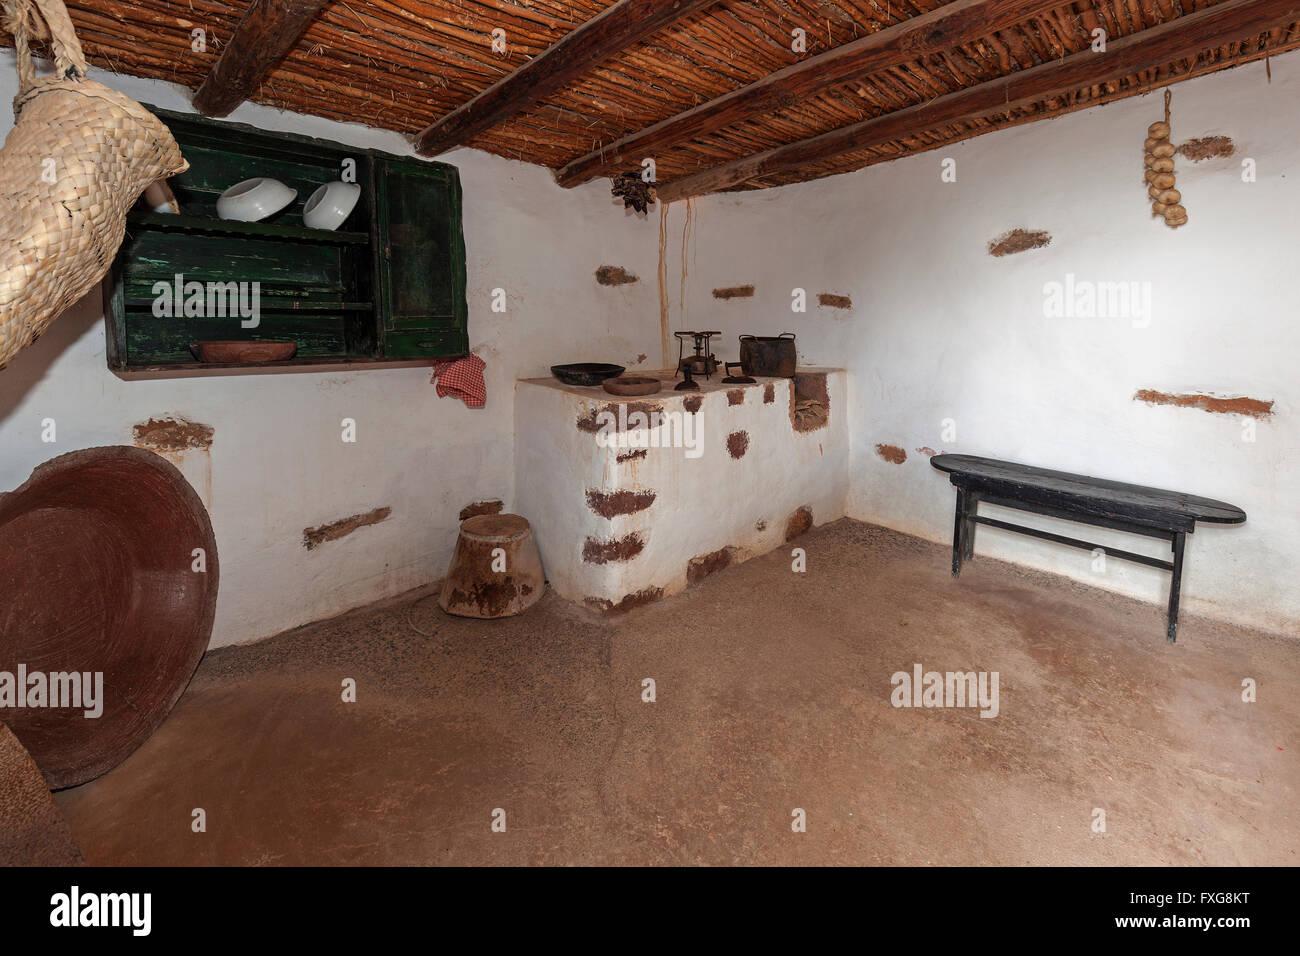 Küche, Kamin im Freilichtmuseum, Museum Dorf Ecomuseo De La Alcogida ...